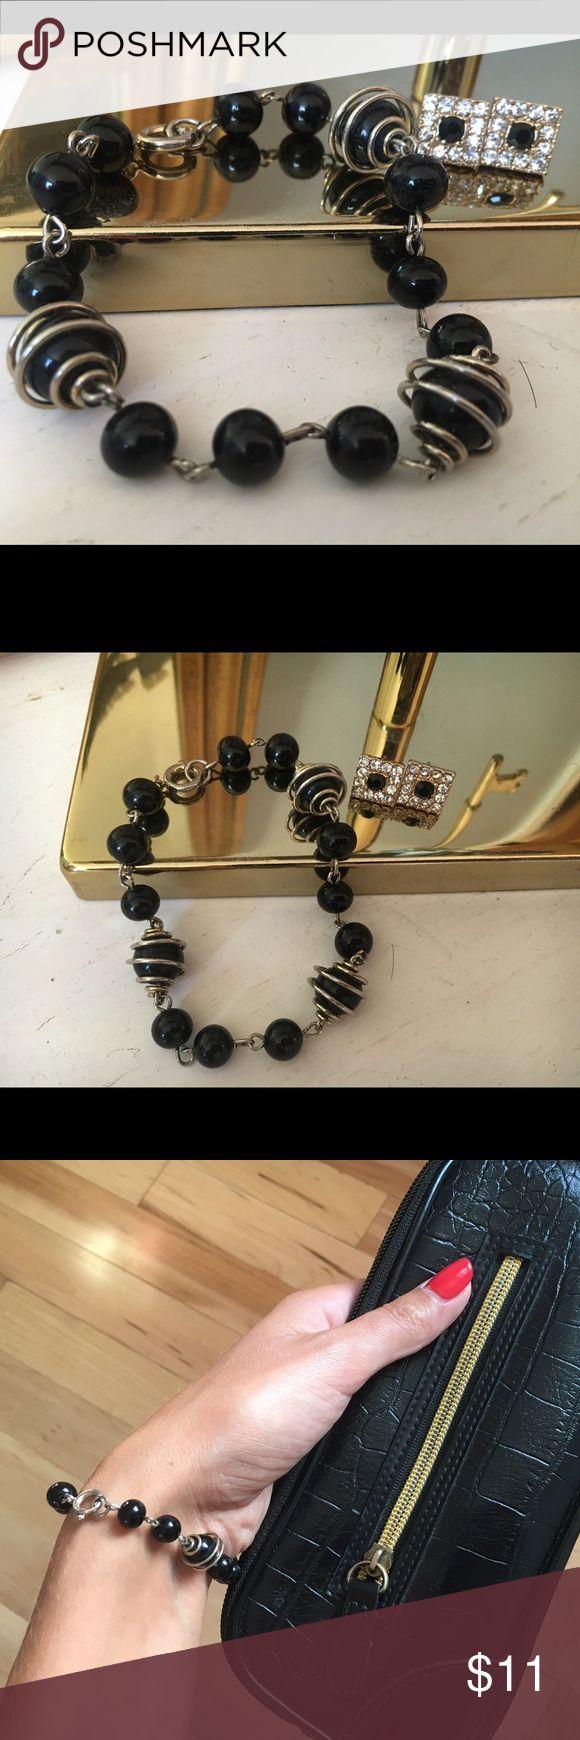 Earing and Bracelet bundle Bracelet from Germany, earnings do not have backs Jewelry Bracelets